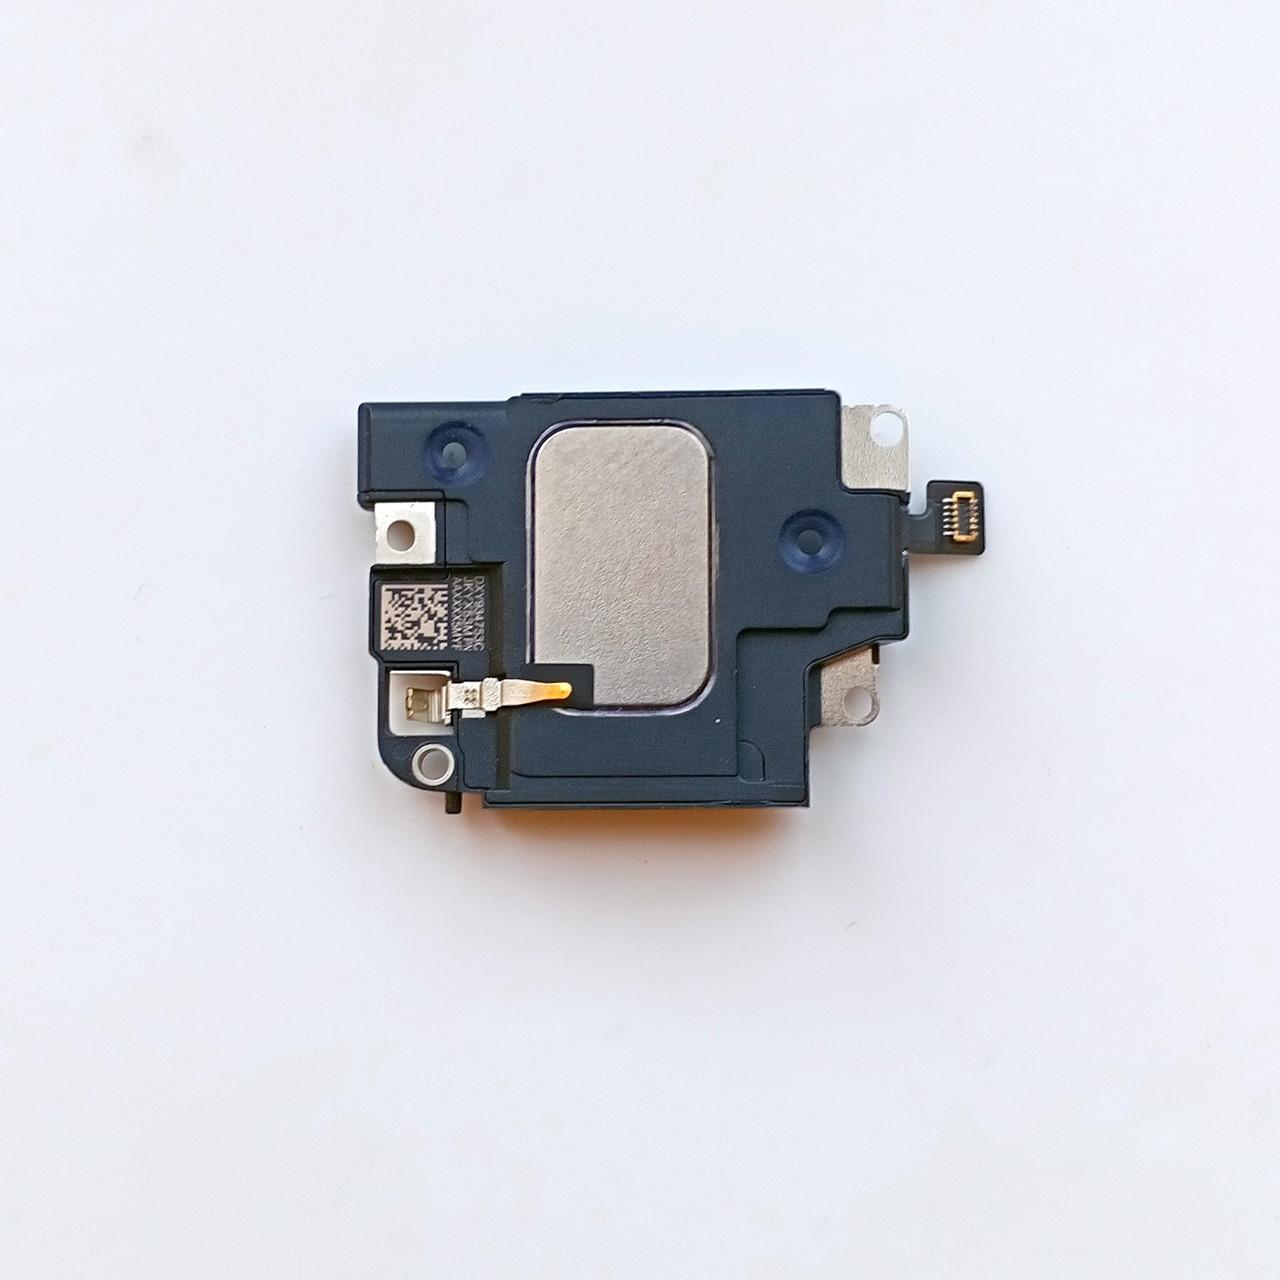 Звонок Novacel для Apple iPhone 11 Pro Max